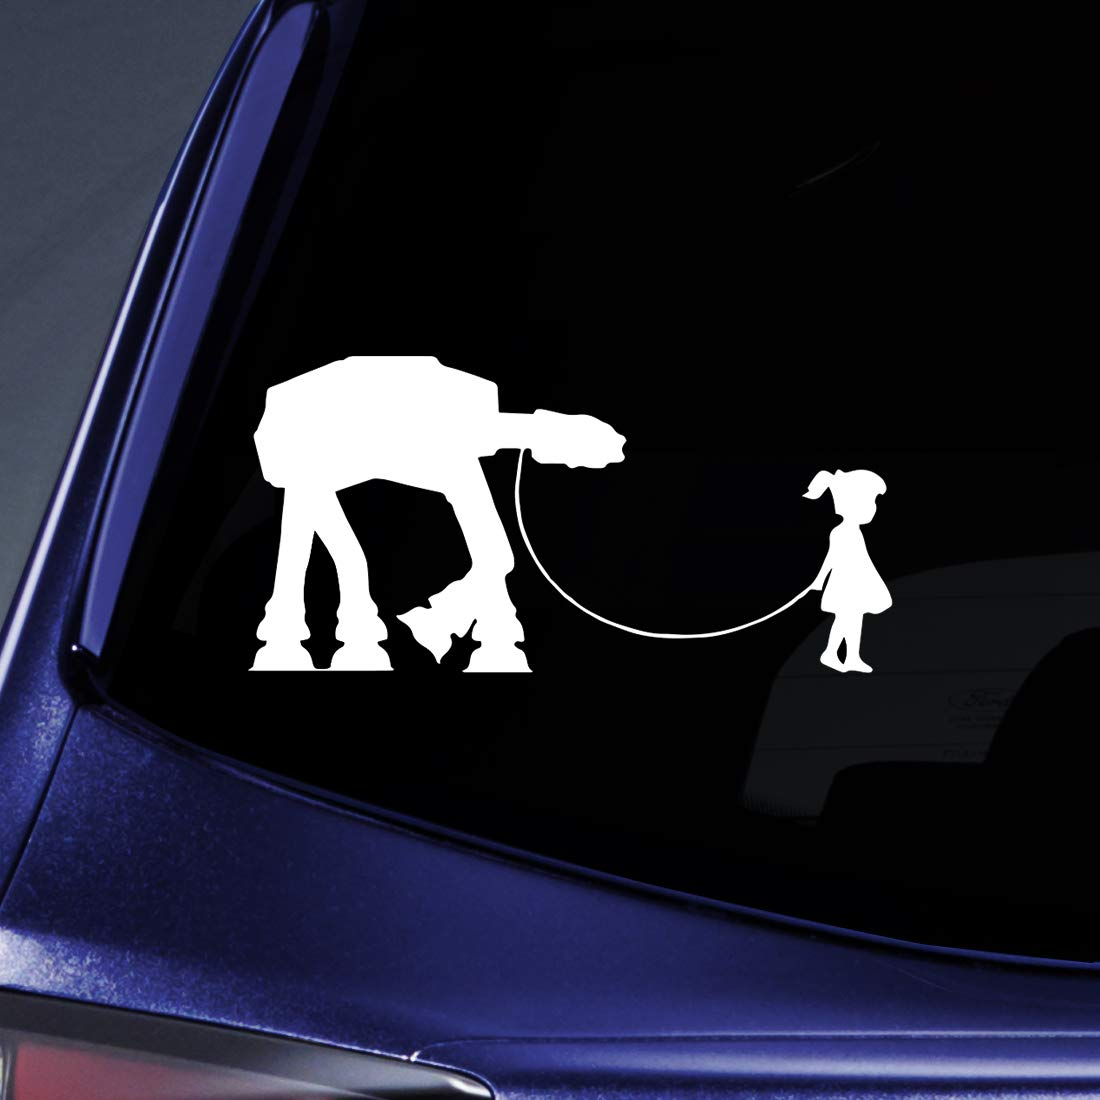 MAX-100015 Sticker Decal Notebook Car Laptop 8 Bargain Max Decals White Girl Walking Robot